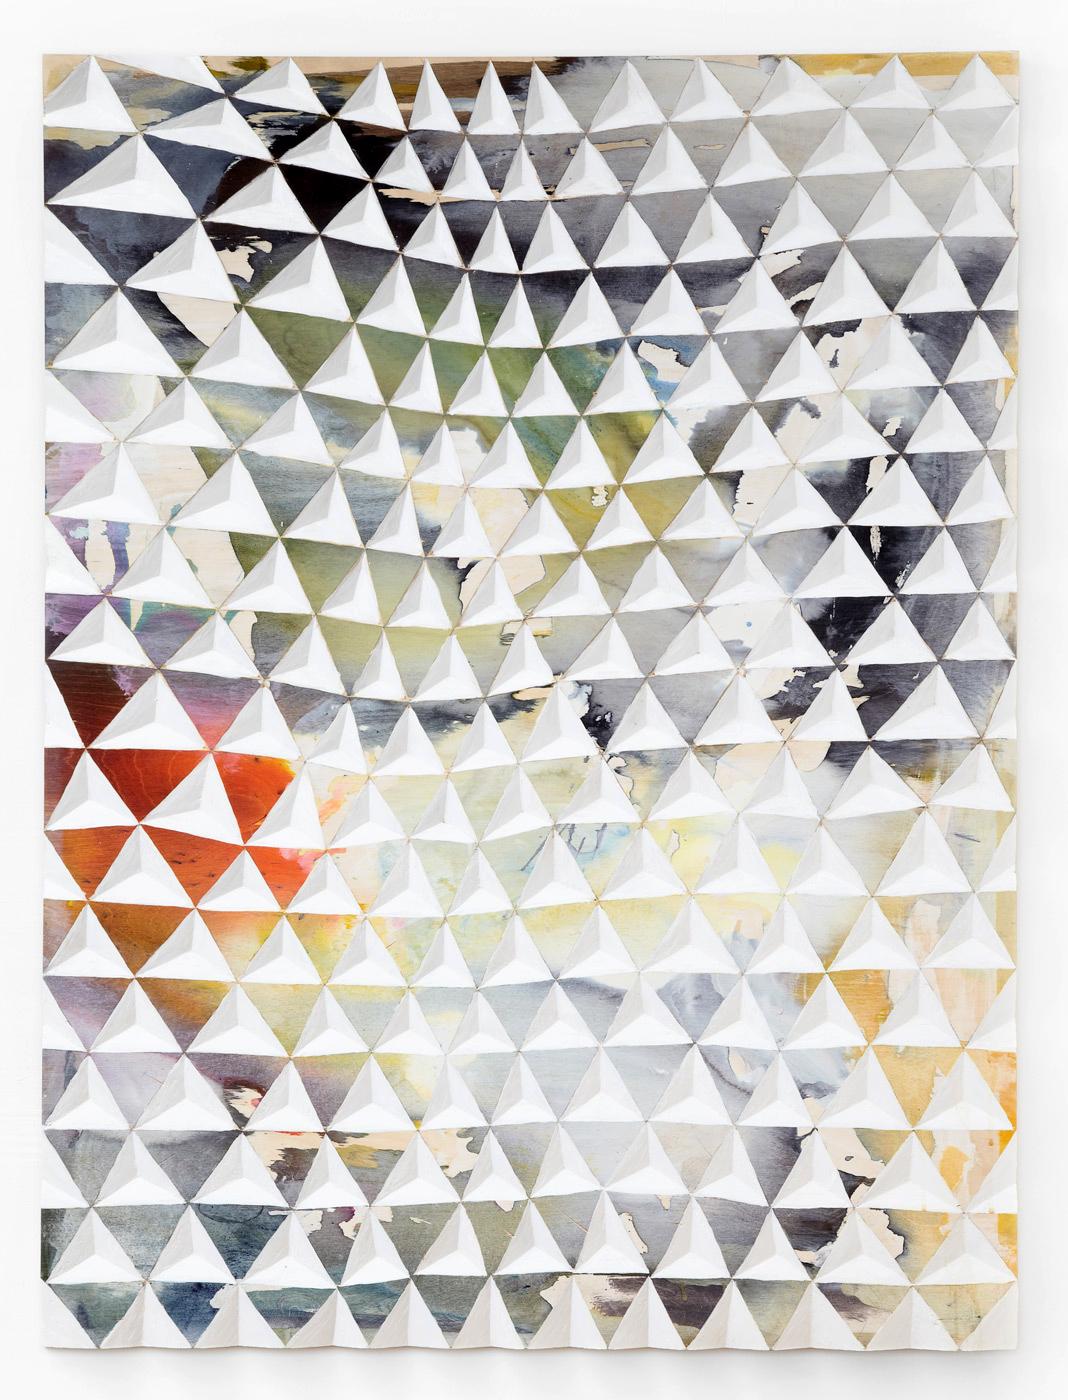 Gerard Mullin, Untitled, 2013, watercolour, wood dye acrylic on wood, 48 x 36 inches